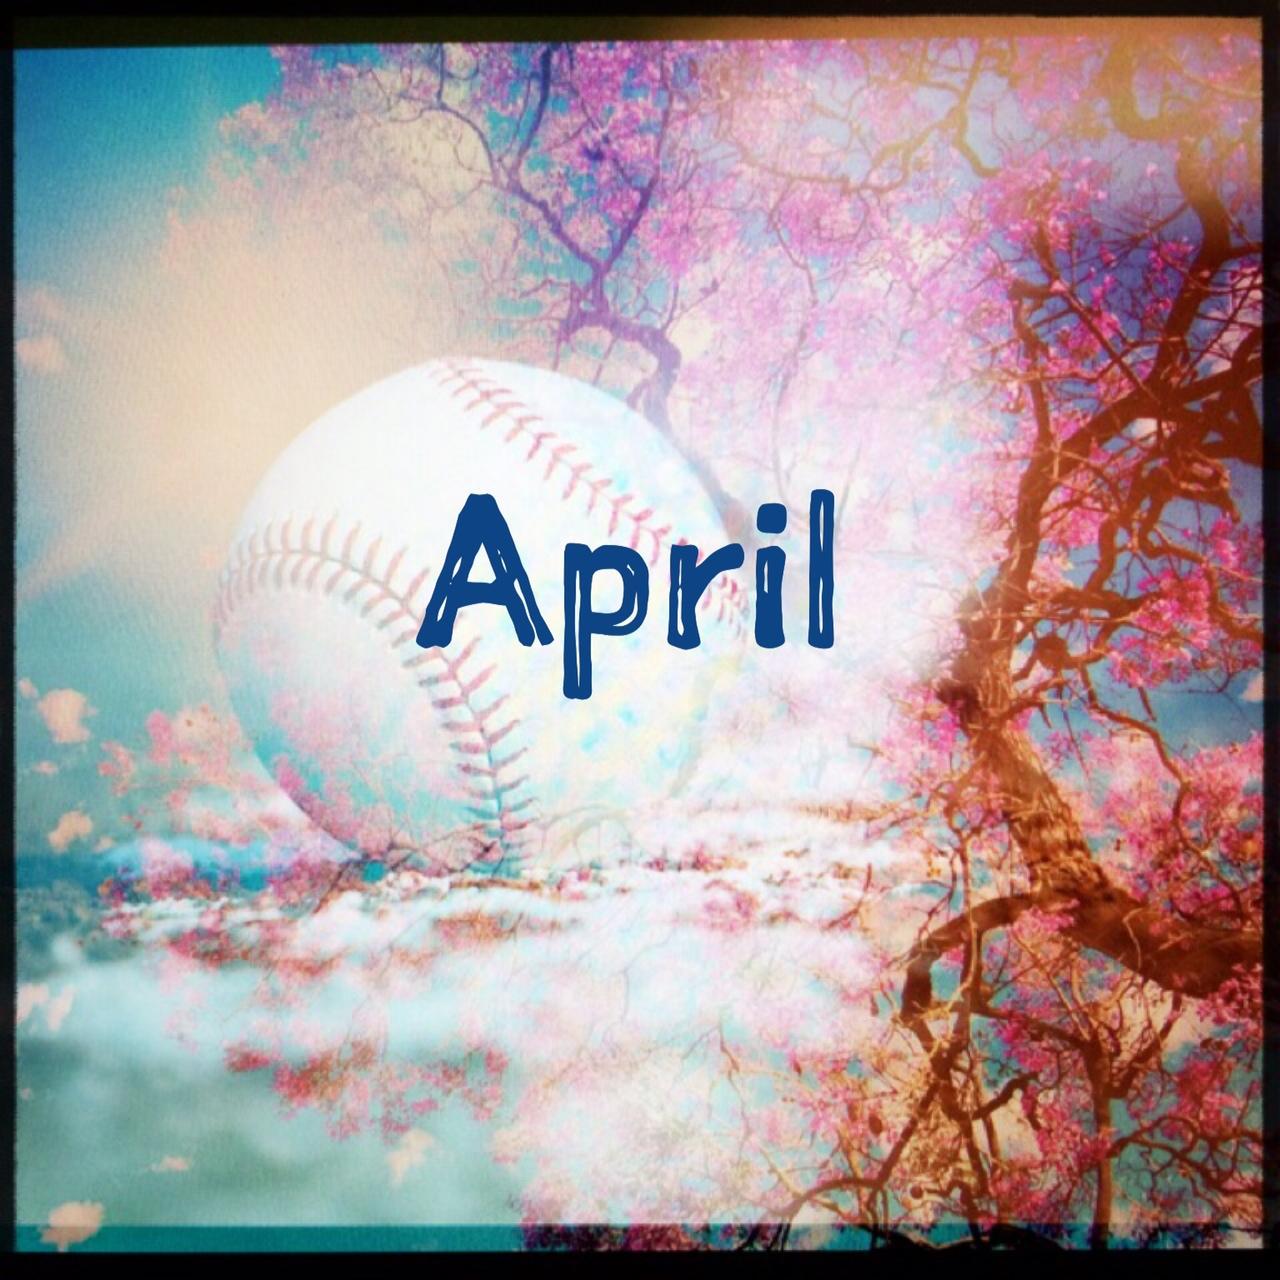 April album image.jpg